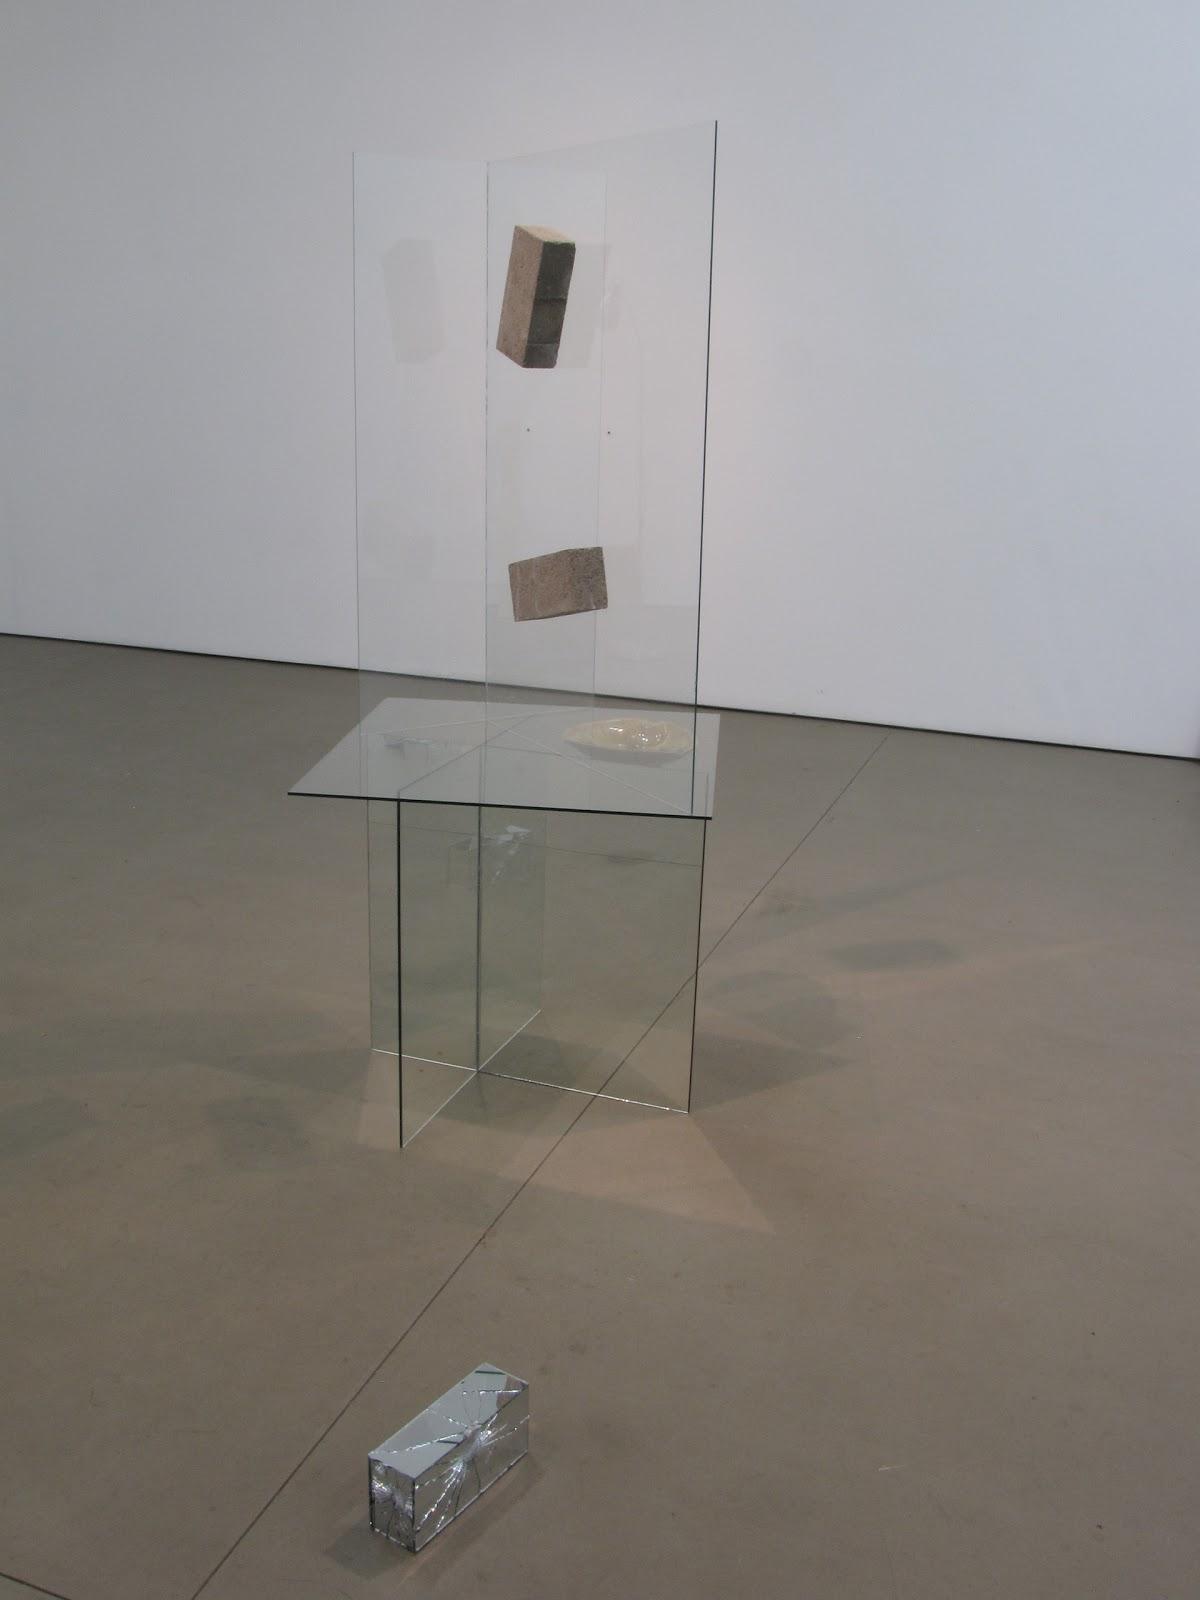 "Architect , 60"" x 22"" x 24"", transparent glass, mirror glass, found ashtray, concrete brick, silicon, 2010"